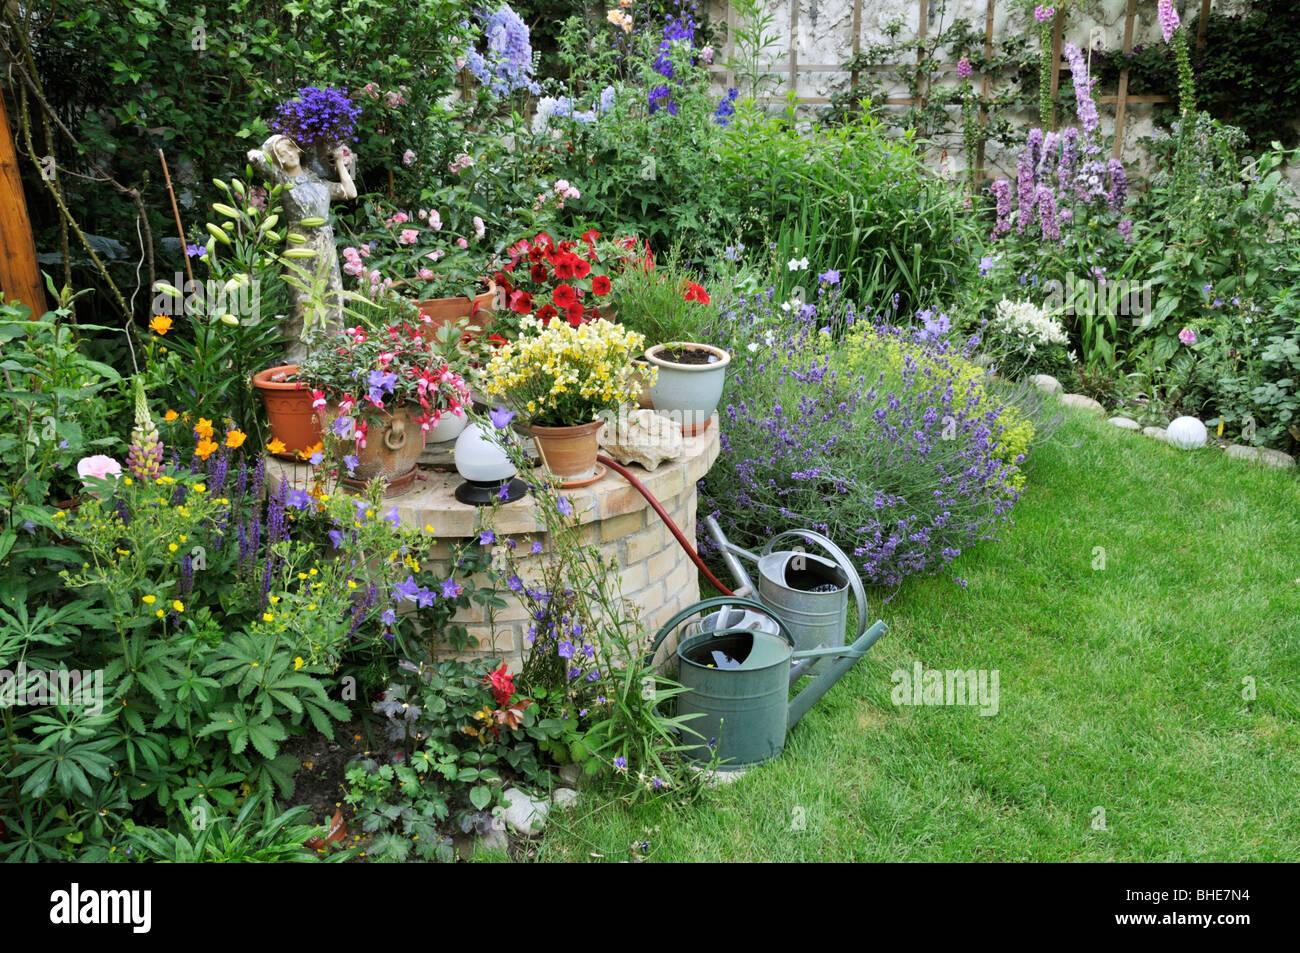 Perennial Bed And Annual Plants In A Backyard Garden. Design: Jutta Wahren